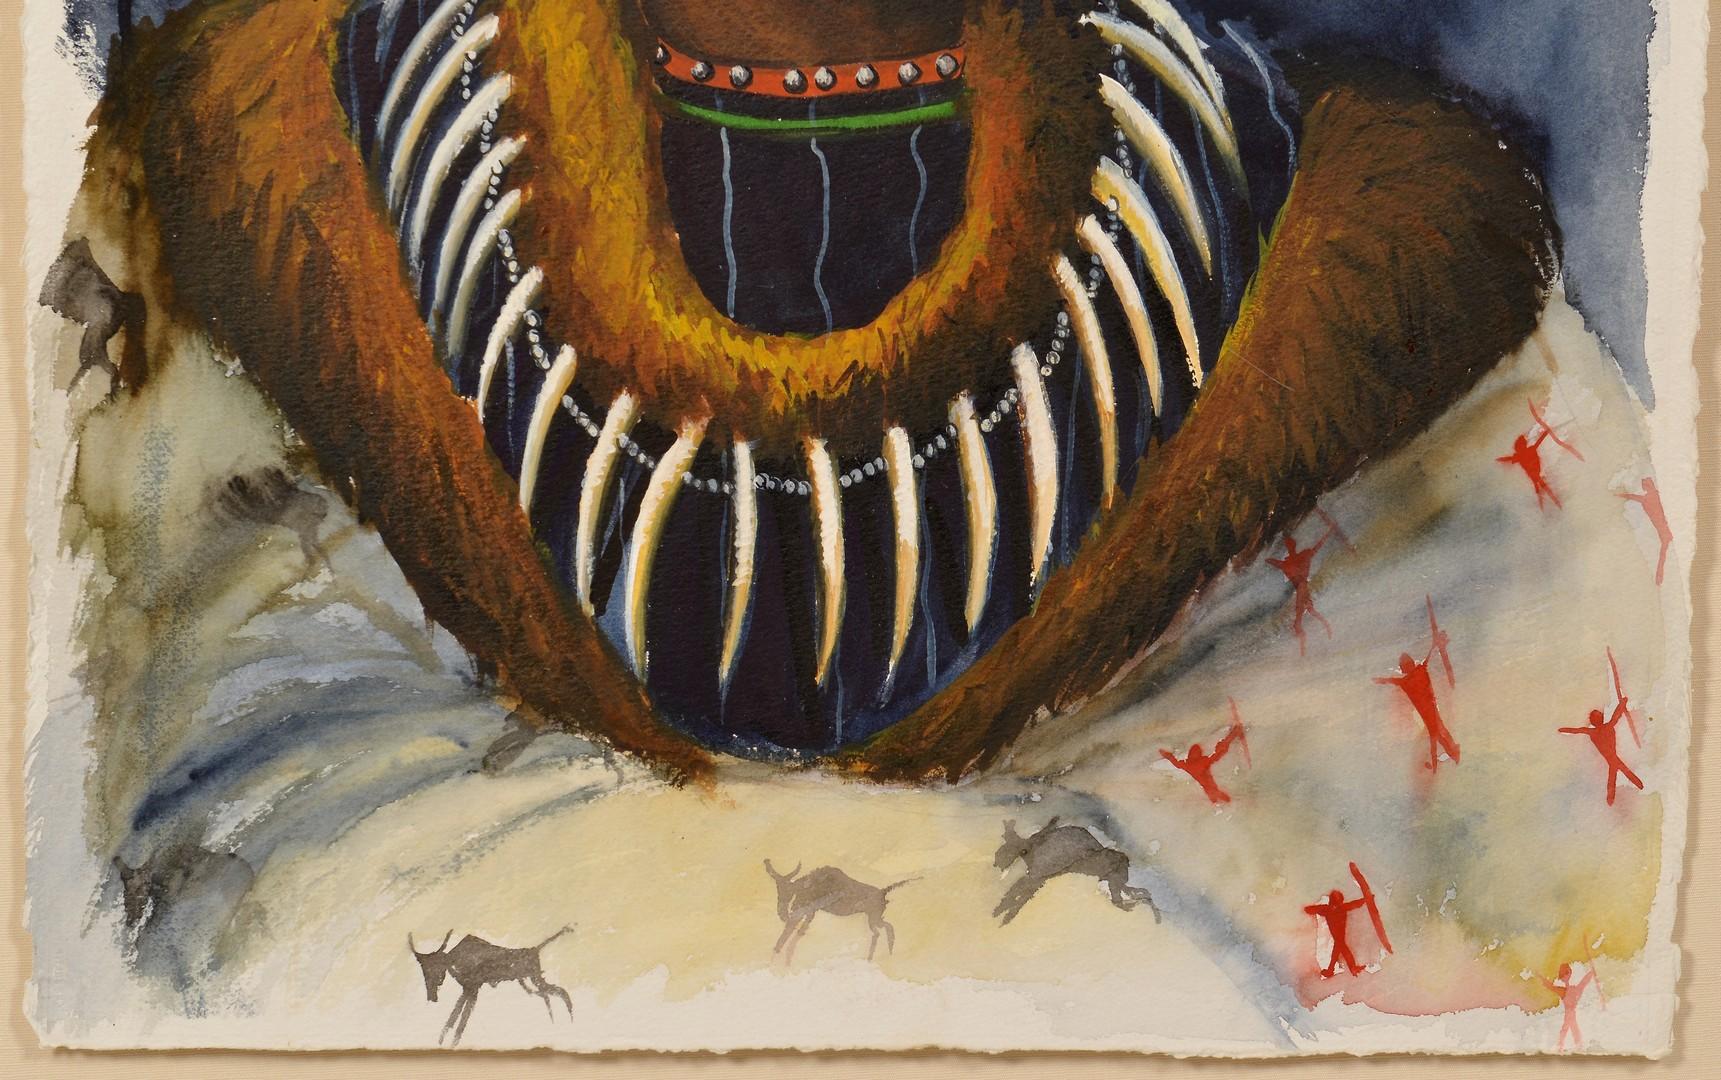 Lot 508: Native American Raymond Nordwall Watercolor